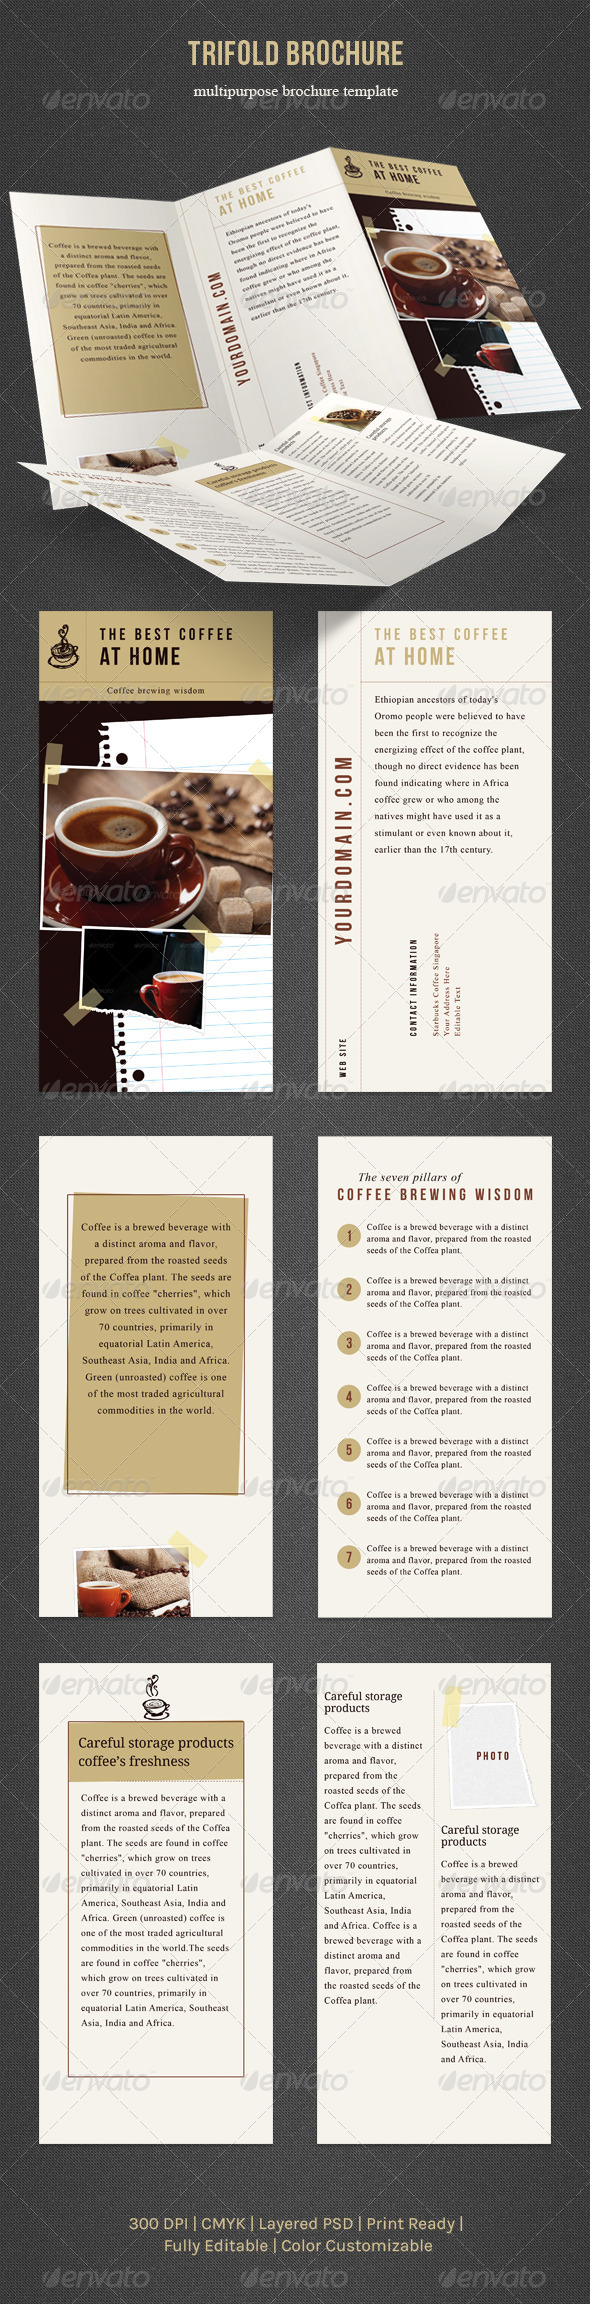 Trifold Brochure - Informational Brochures